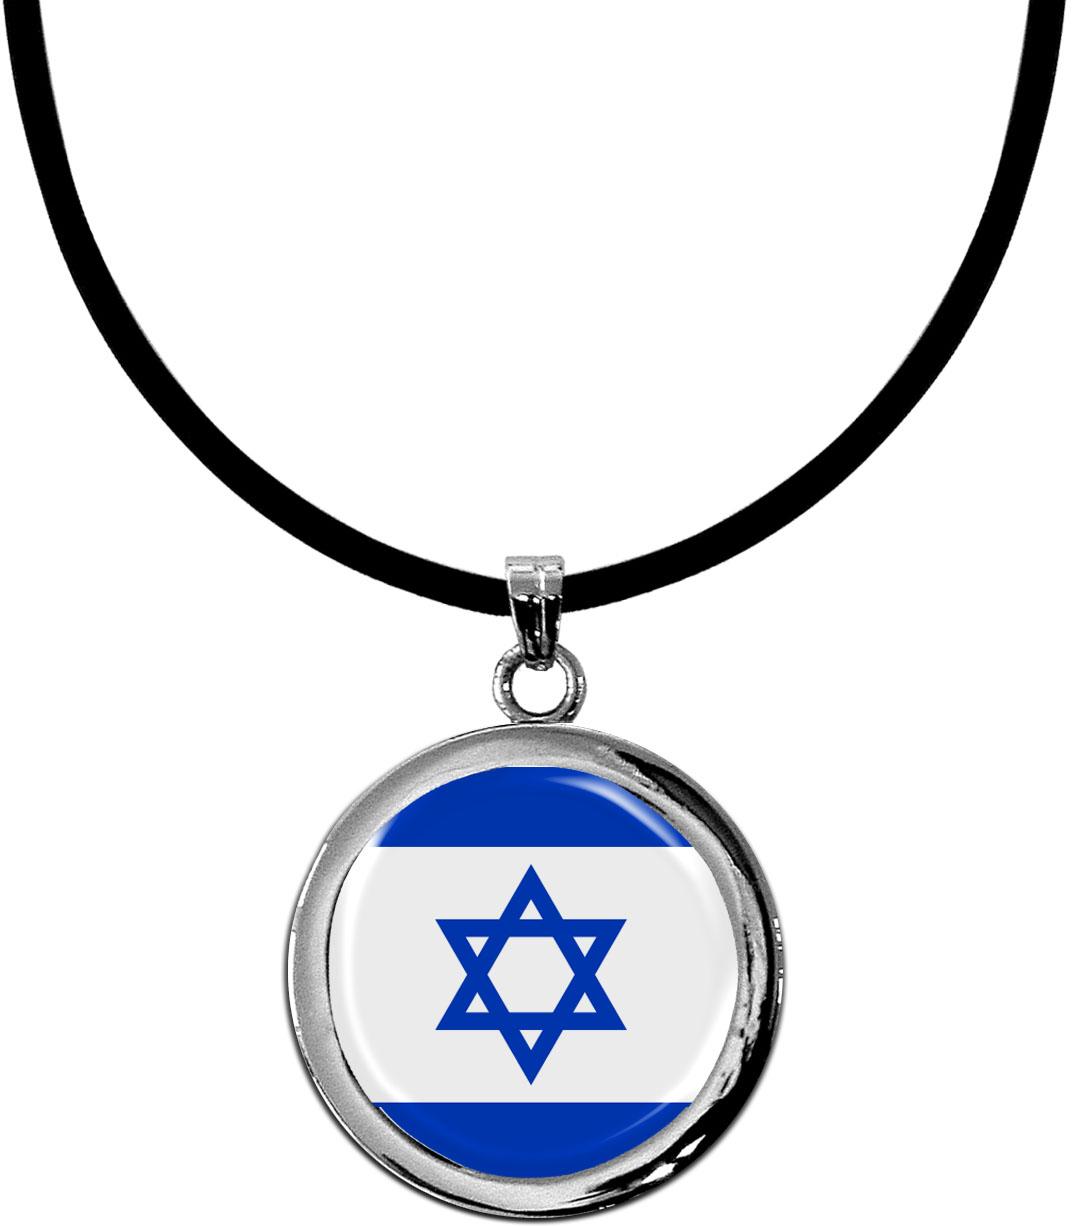 Kettenanhänger / Israel / Silikonband mit Silberverschluss